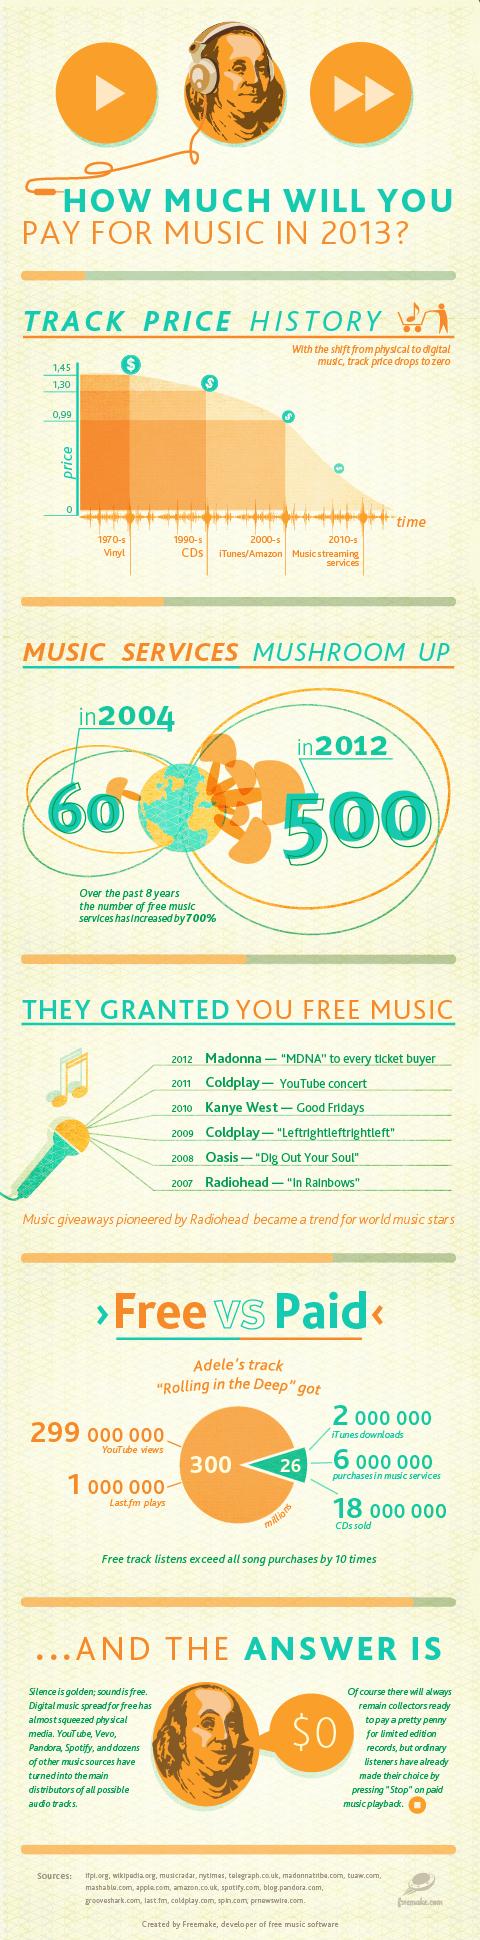 evolucion precio de la musica